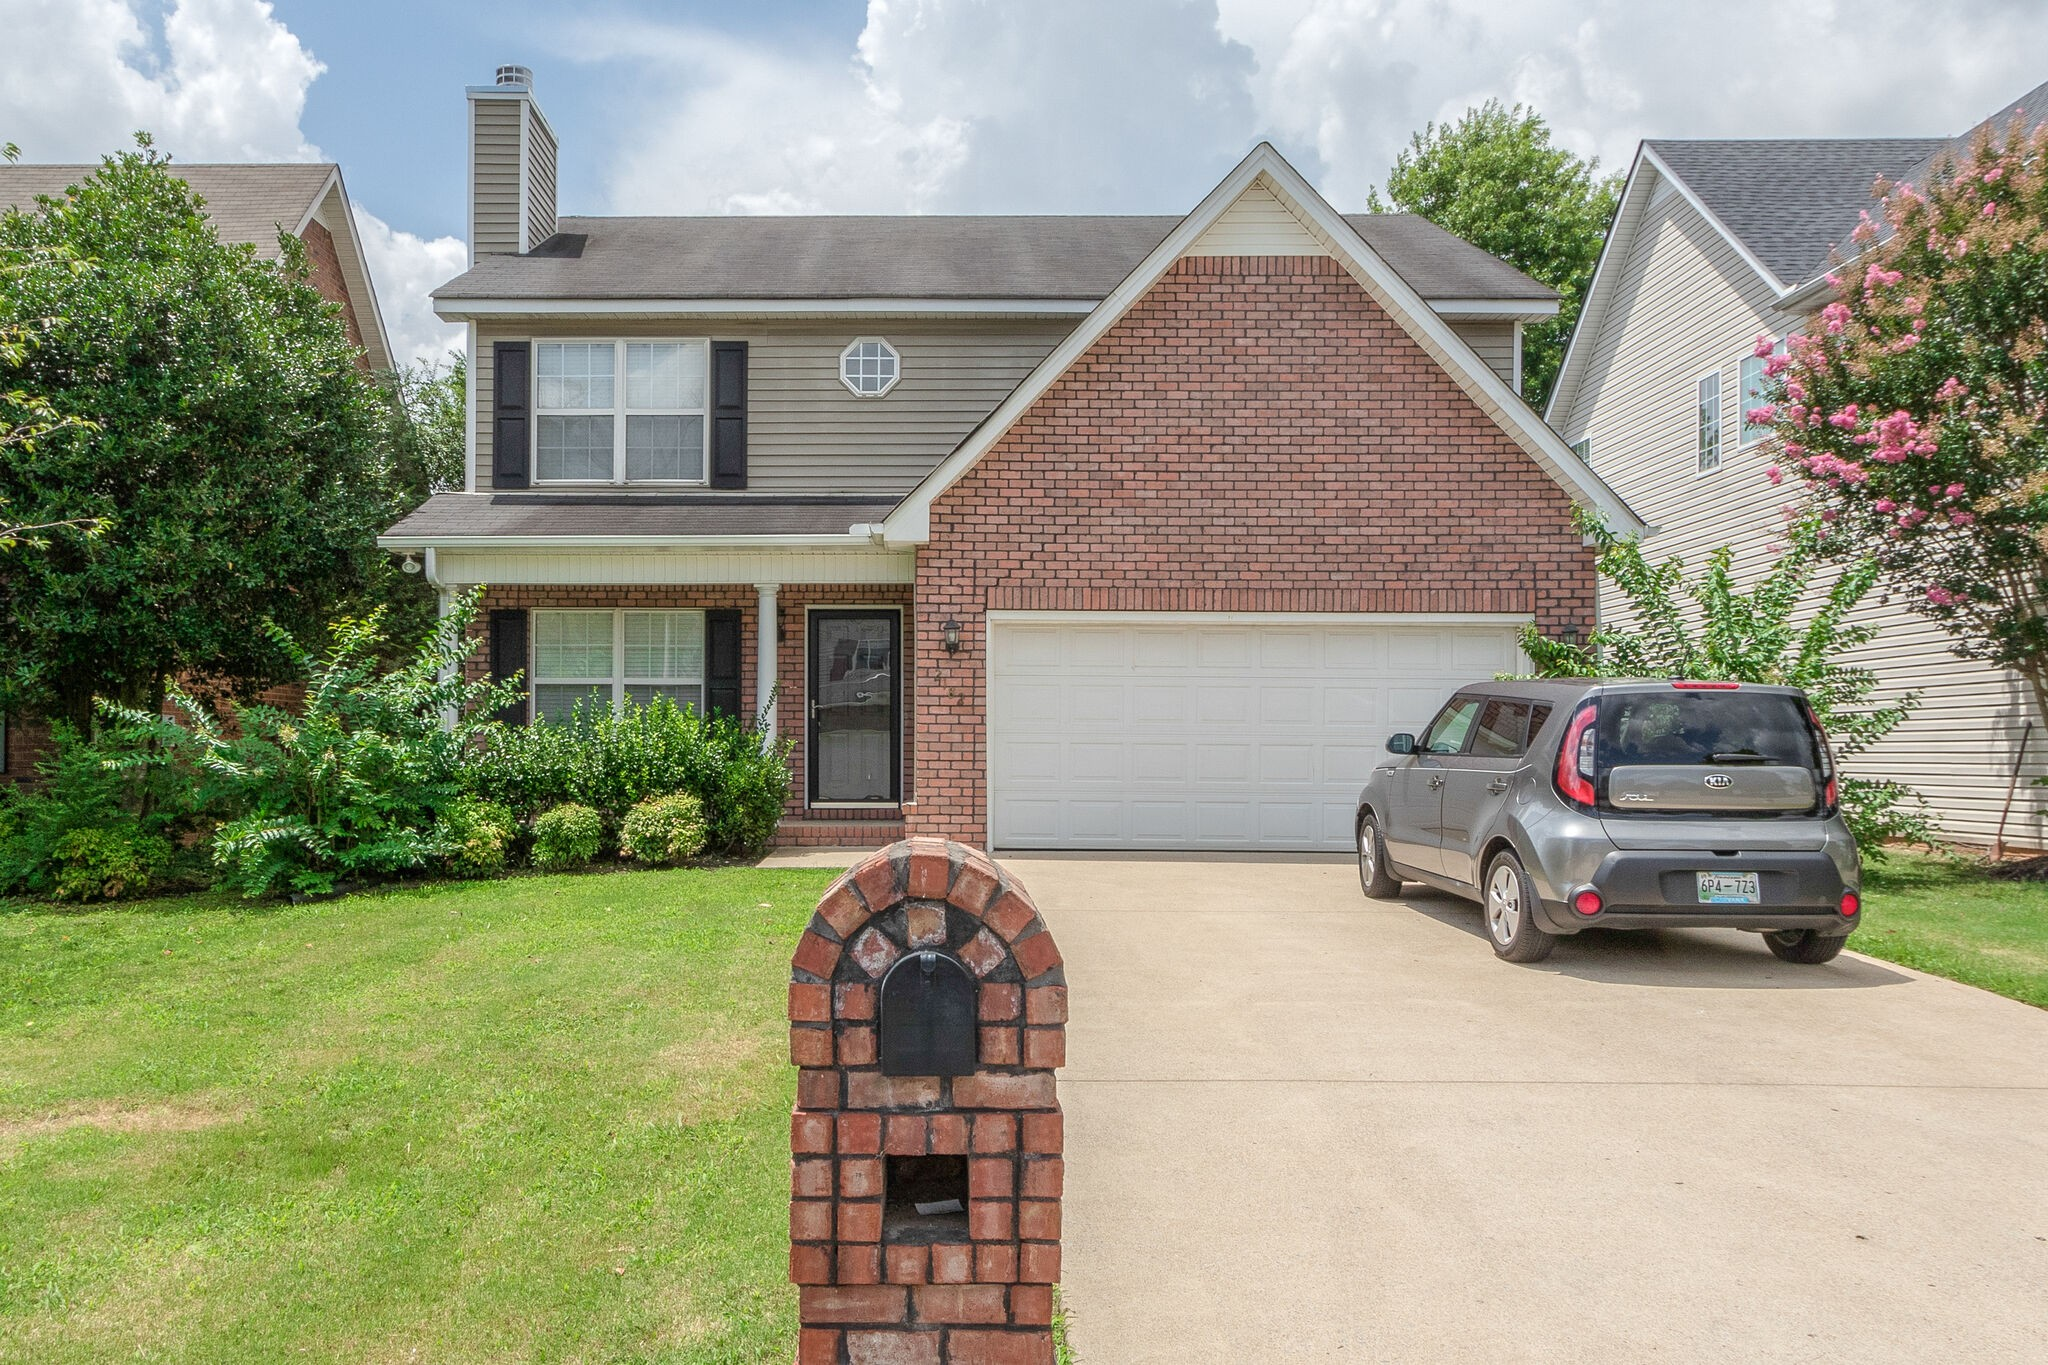 2182 Aberdeen Cir Property Photo - Murfreesboro, TN real estate listing